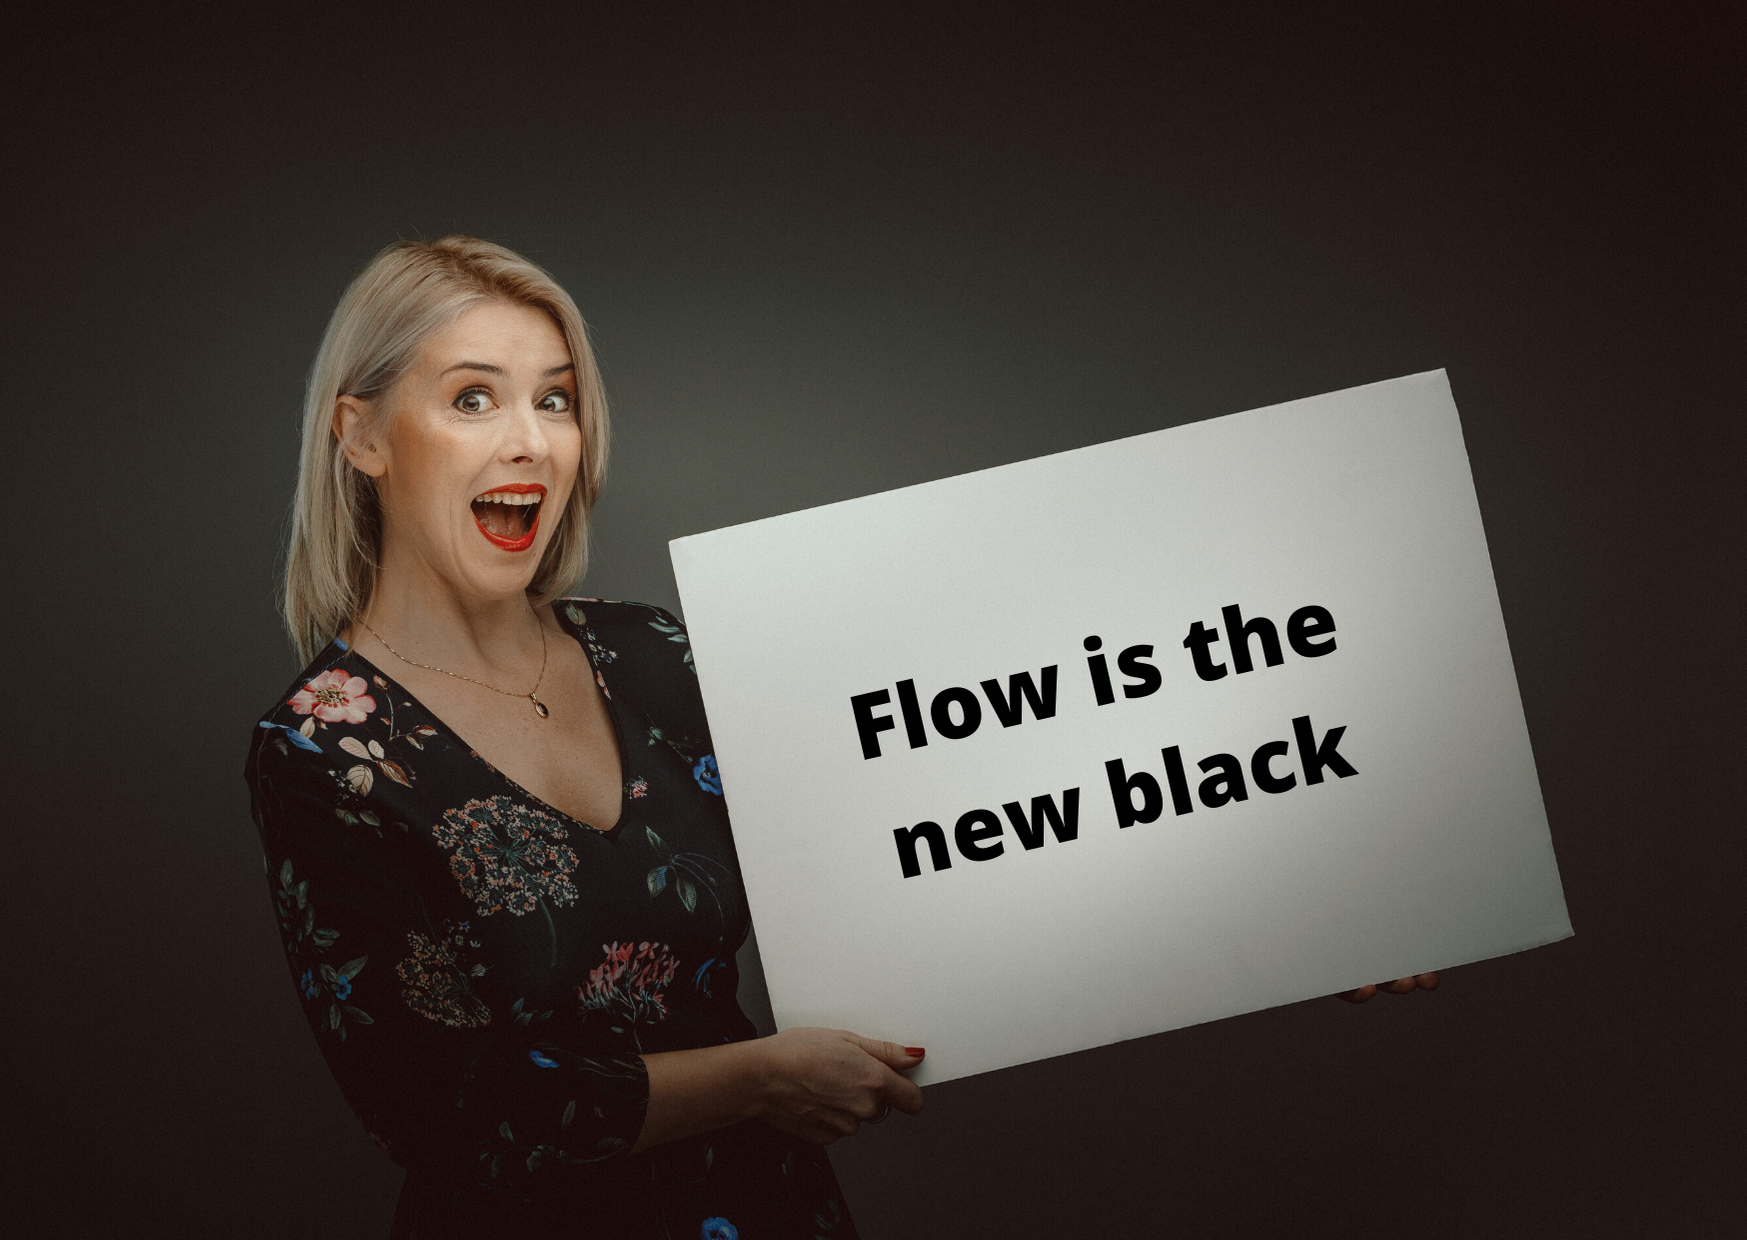 Inga Ezera Flow is the new black